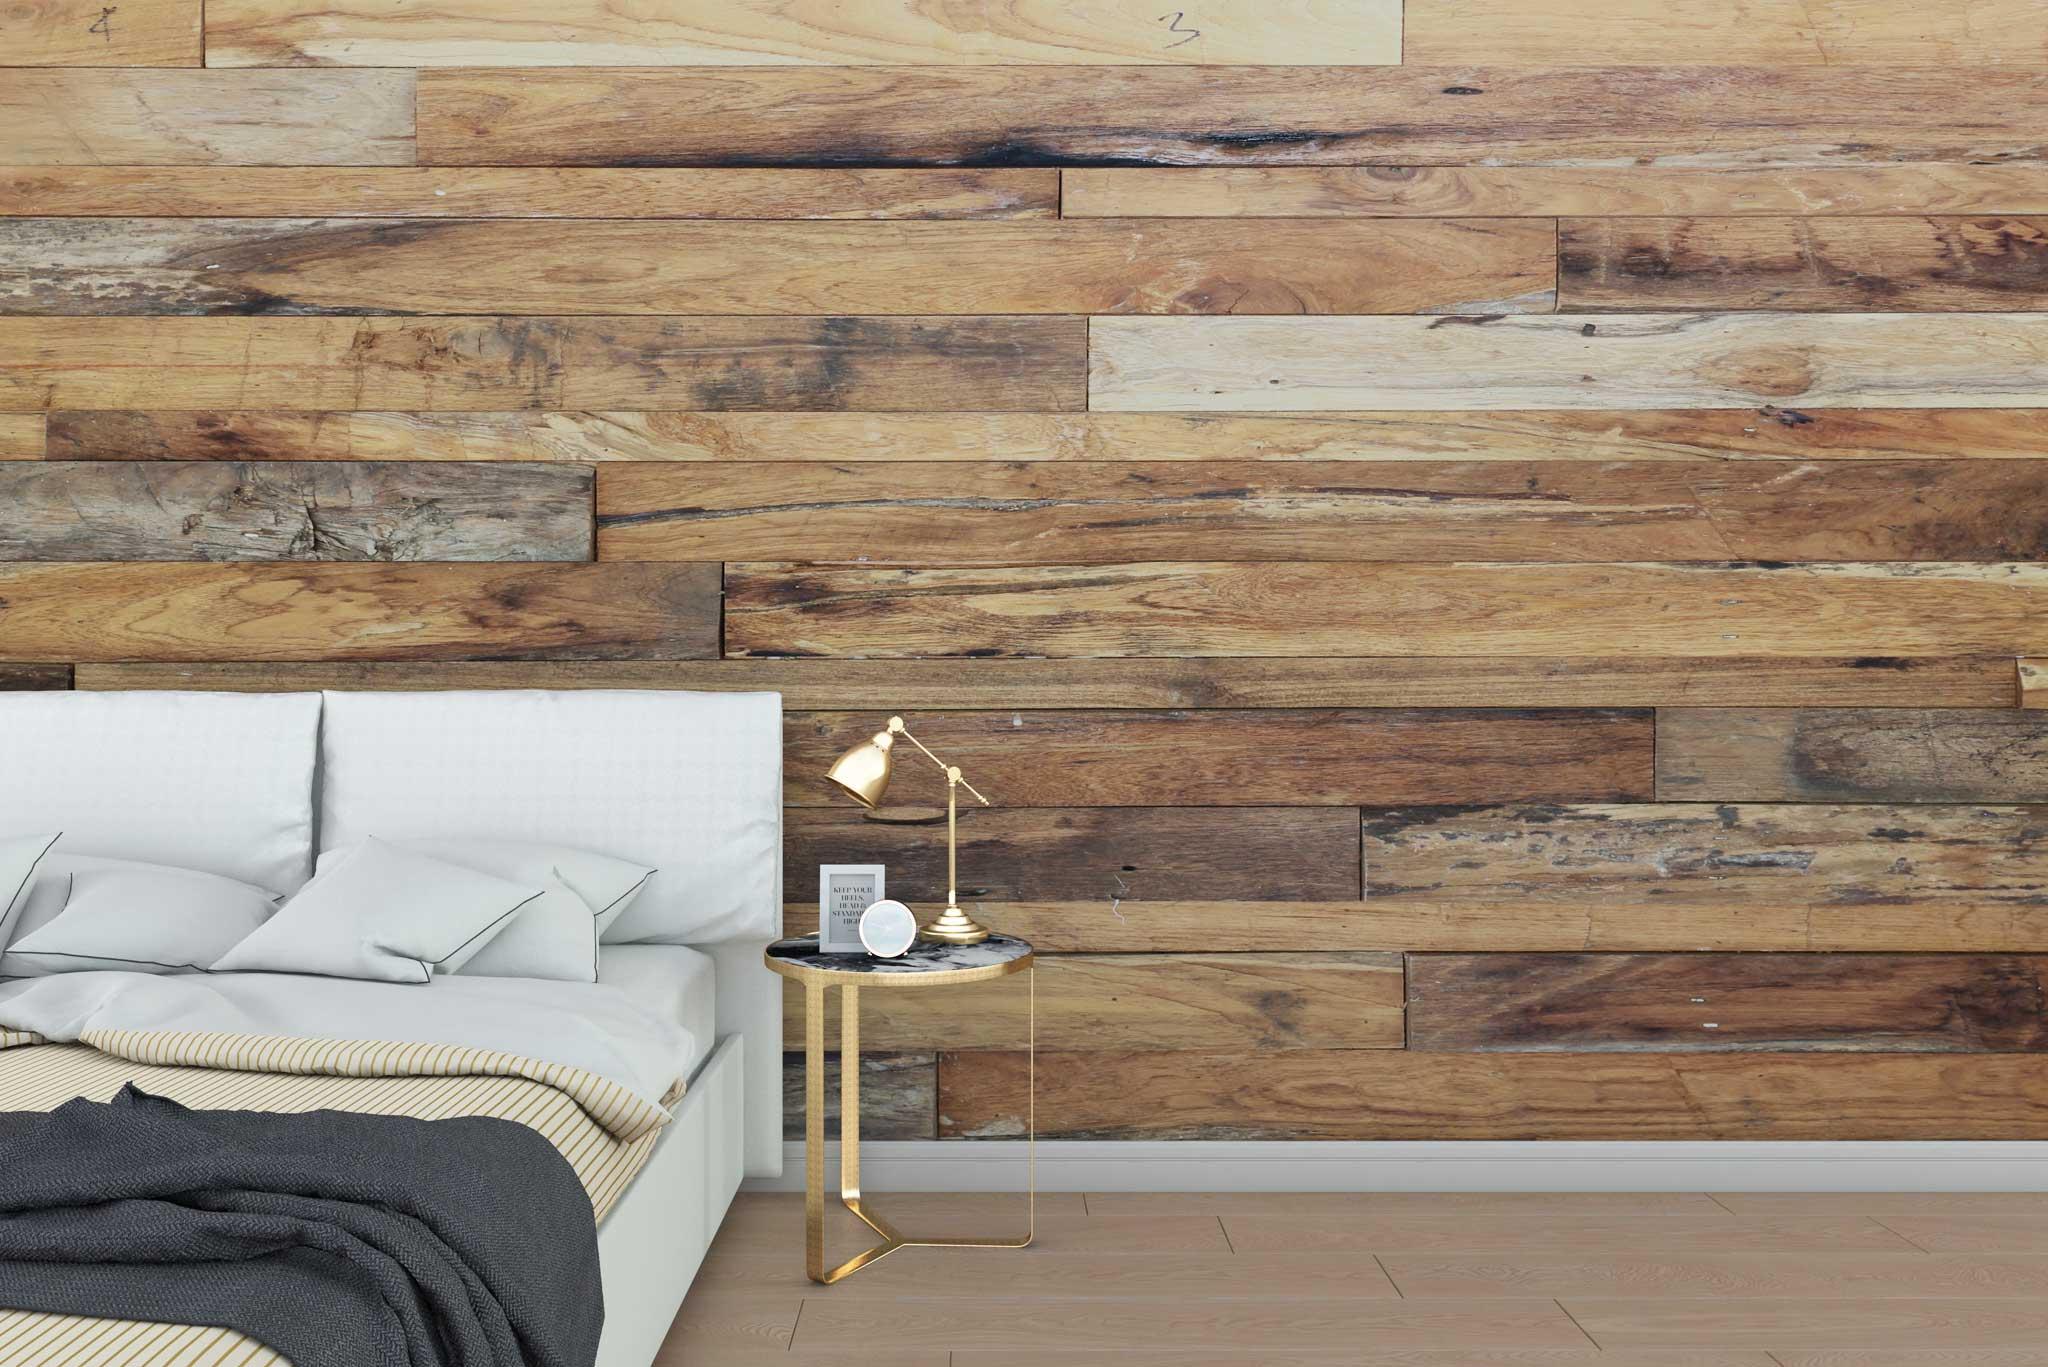 tapet-fototapet-special-personalizat-customizabil-comanda-bucuresti-daring-prints-model-textura-scanduri-lemn-natural-vintage-maro